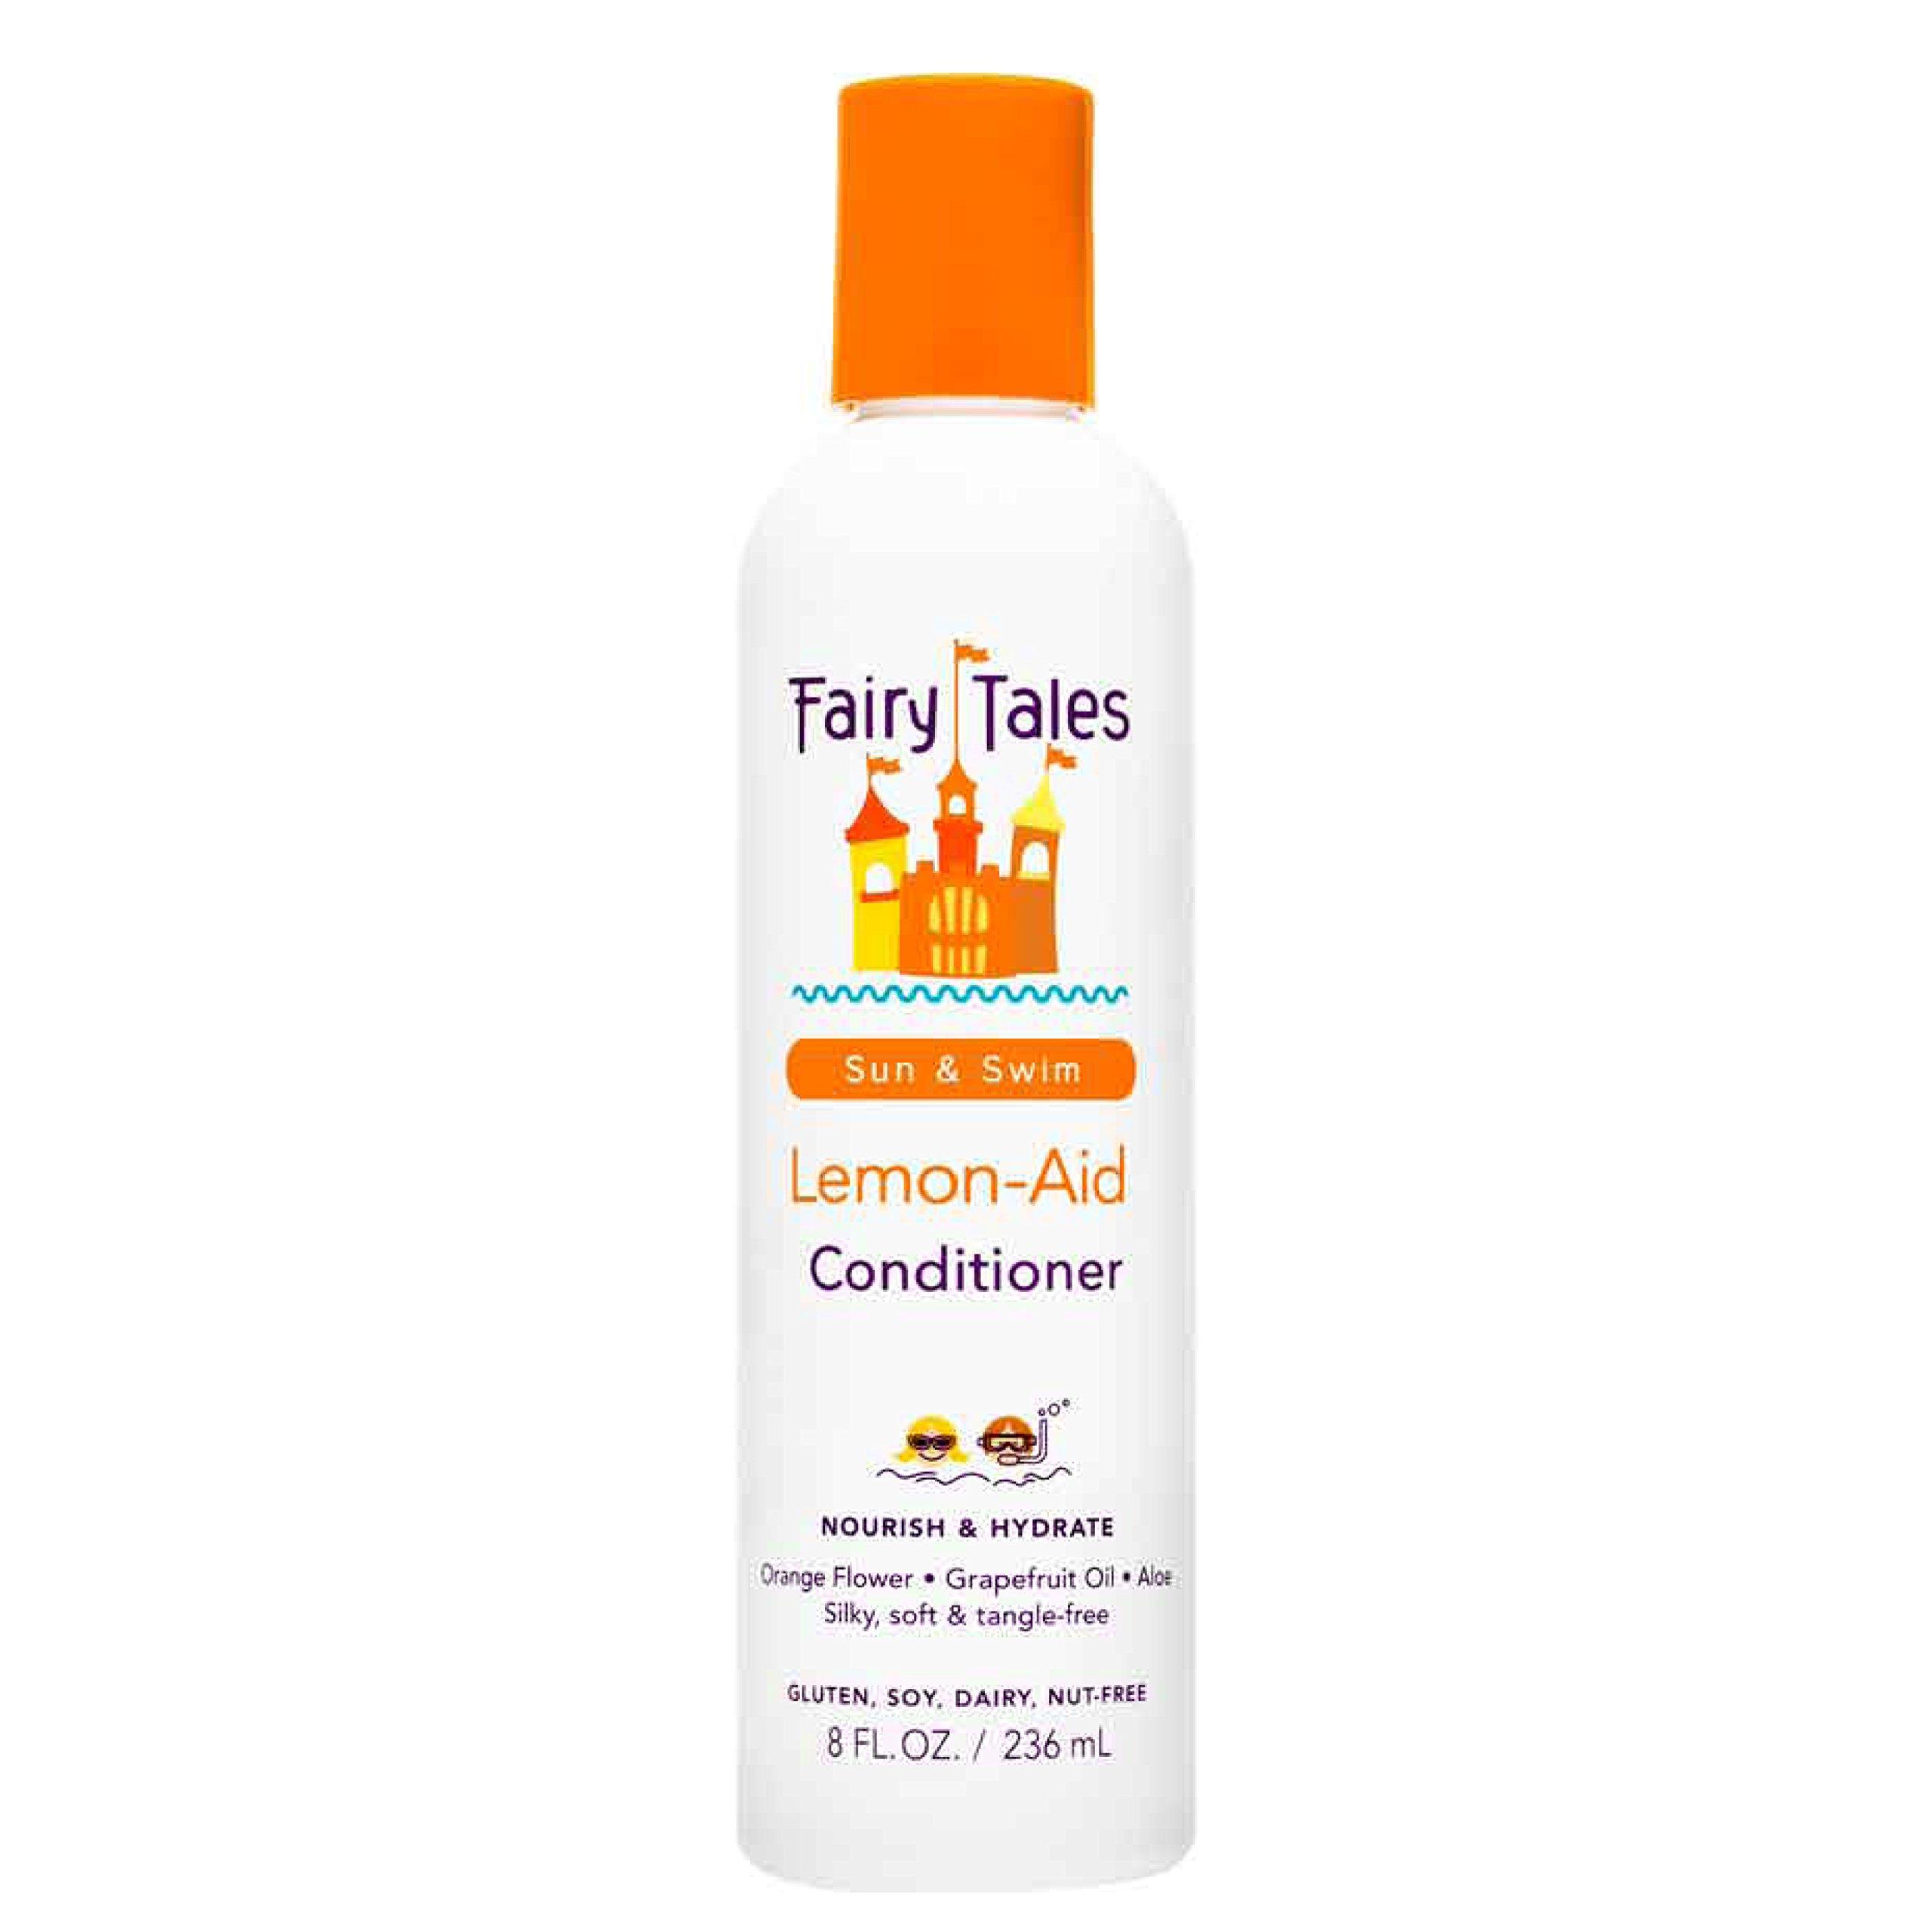 Fairy Tales Sun & Swim Lemon-Aid Conditioner for Kids - 8 oz by Fairy Tales